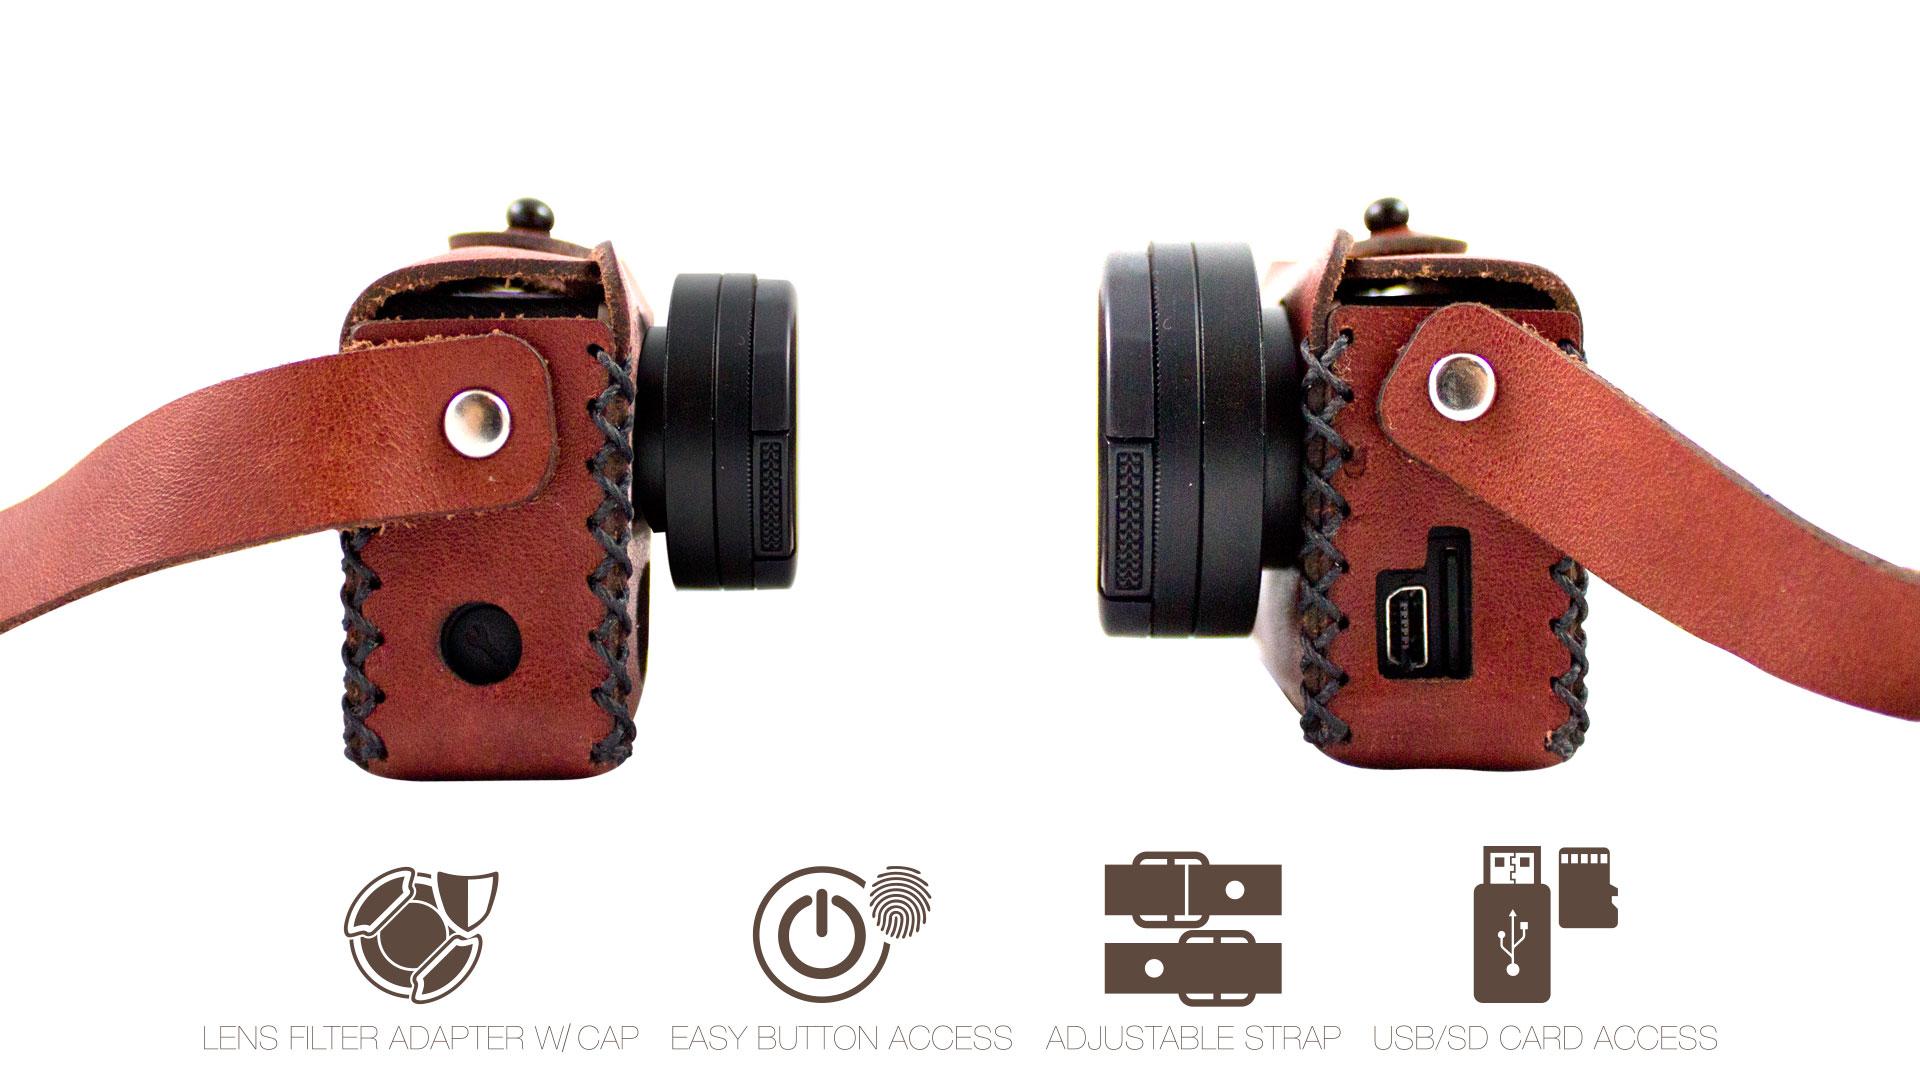 GoPro_Leather_Case_hero3_hero4_features